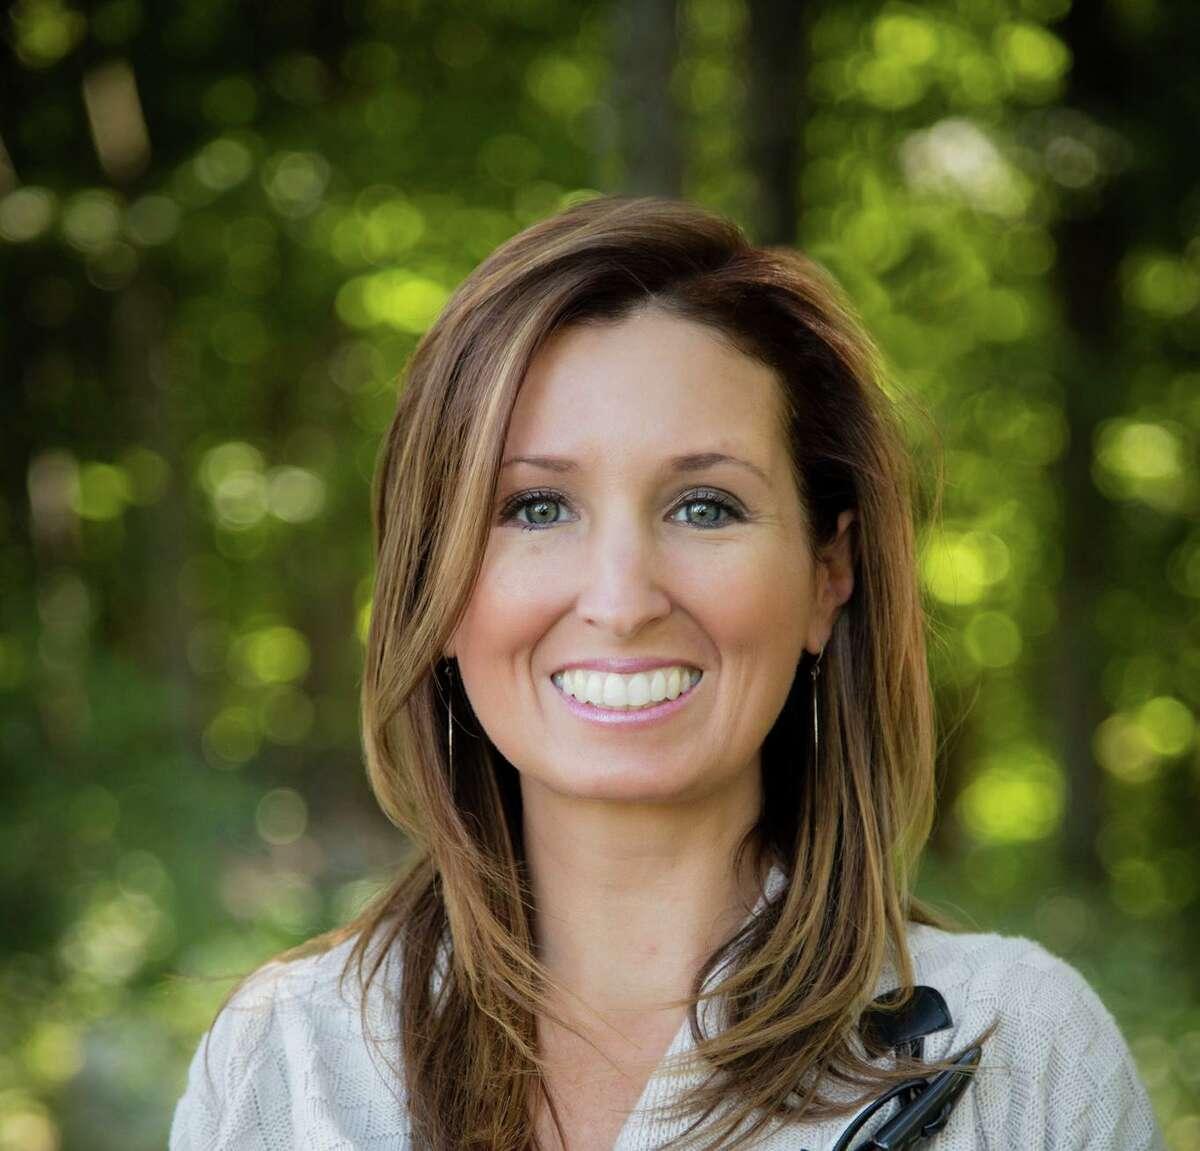 Norwalk Board of Education candidate Erica DePalma